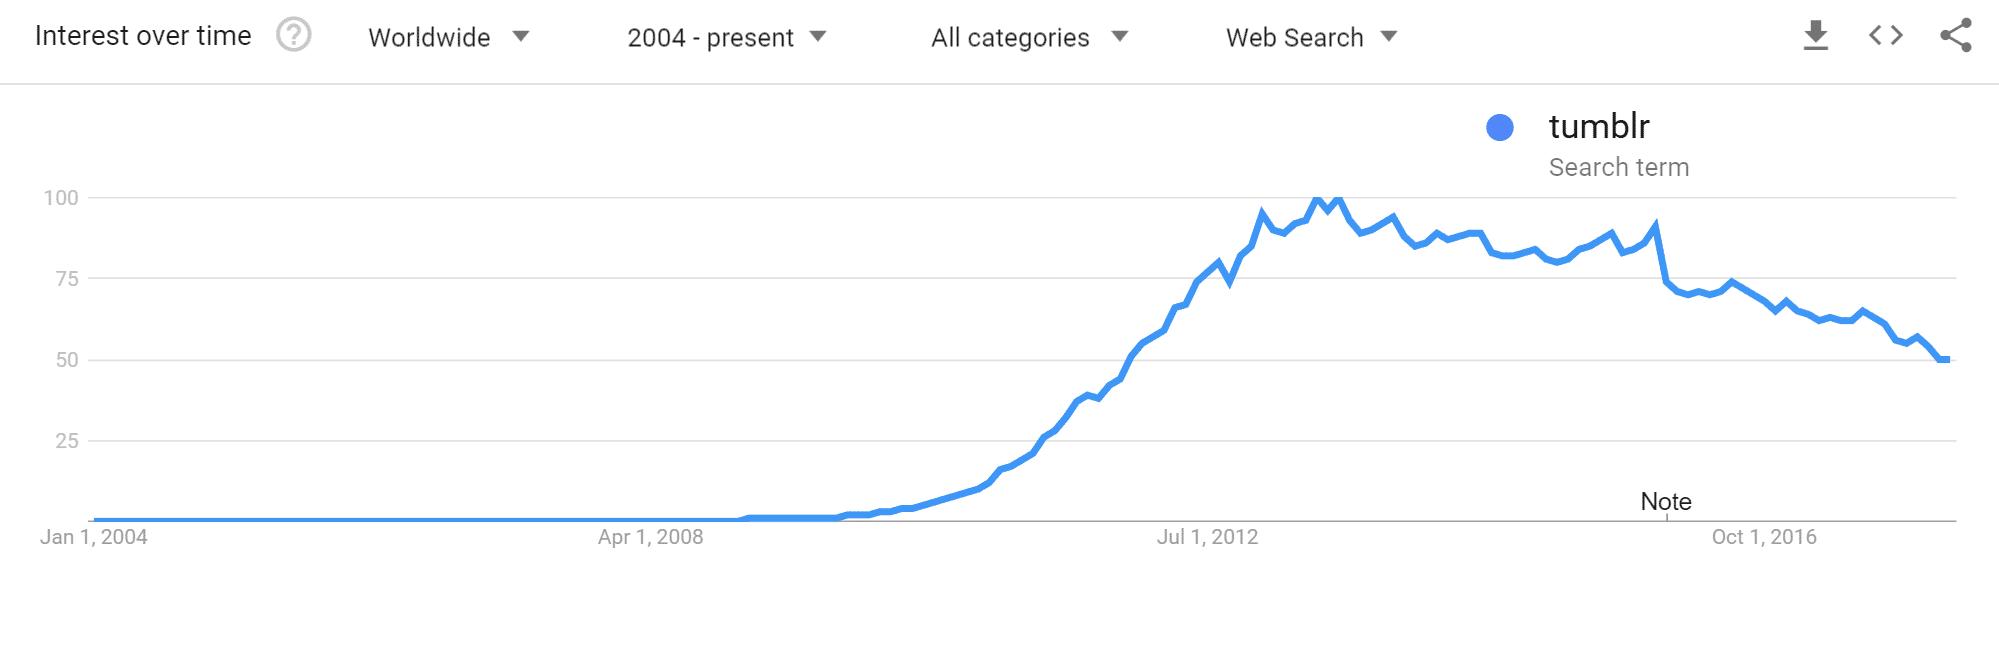 Tumblr Trends